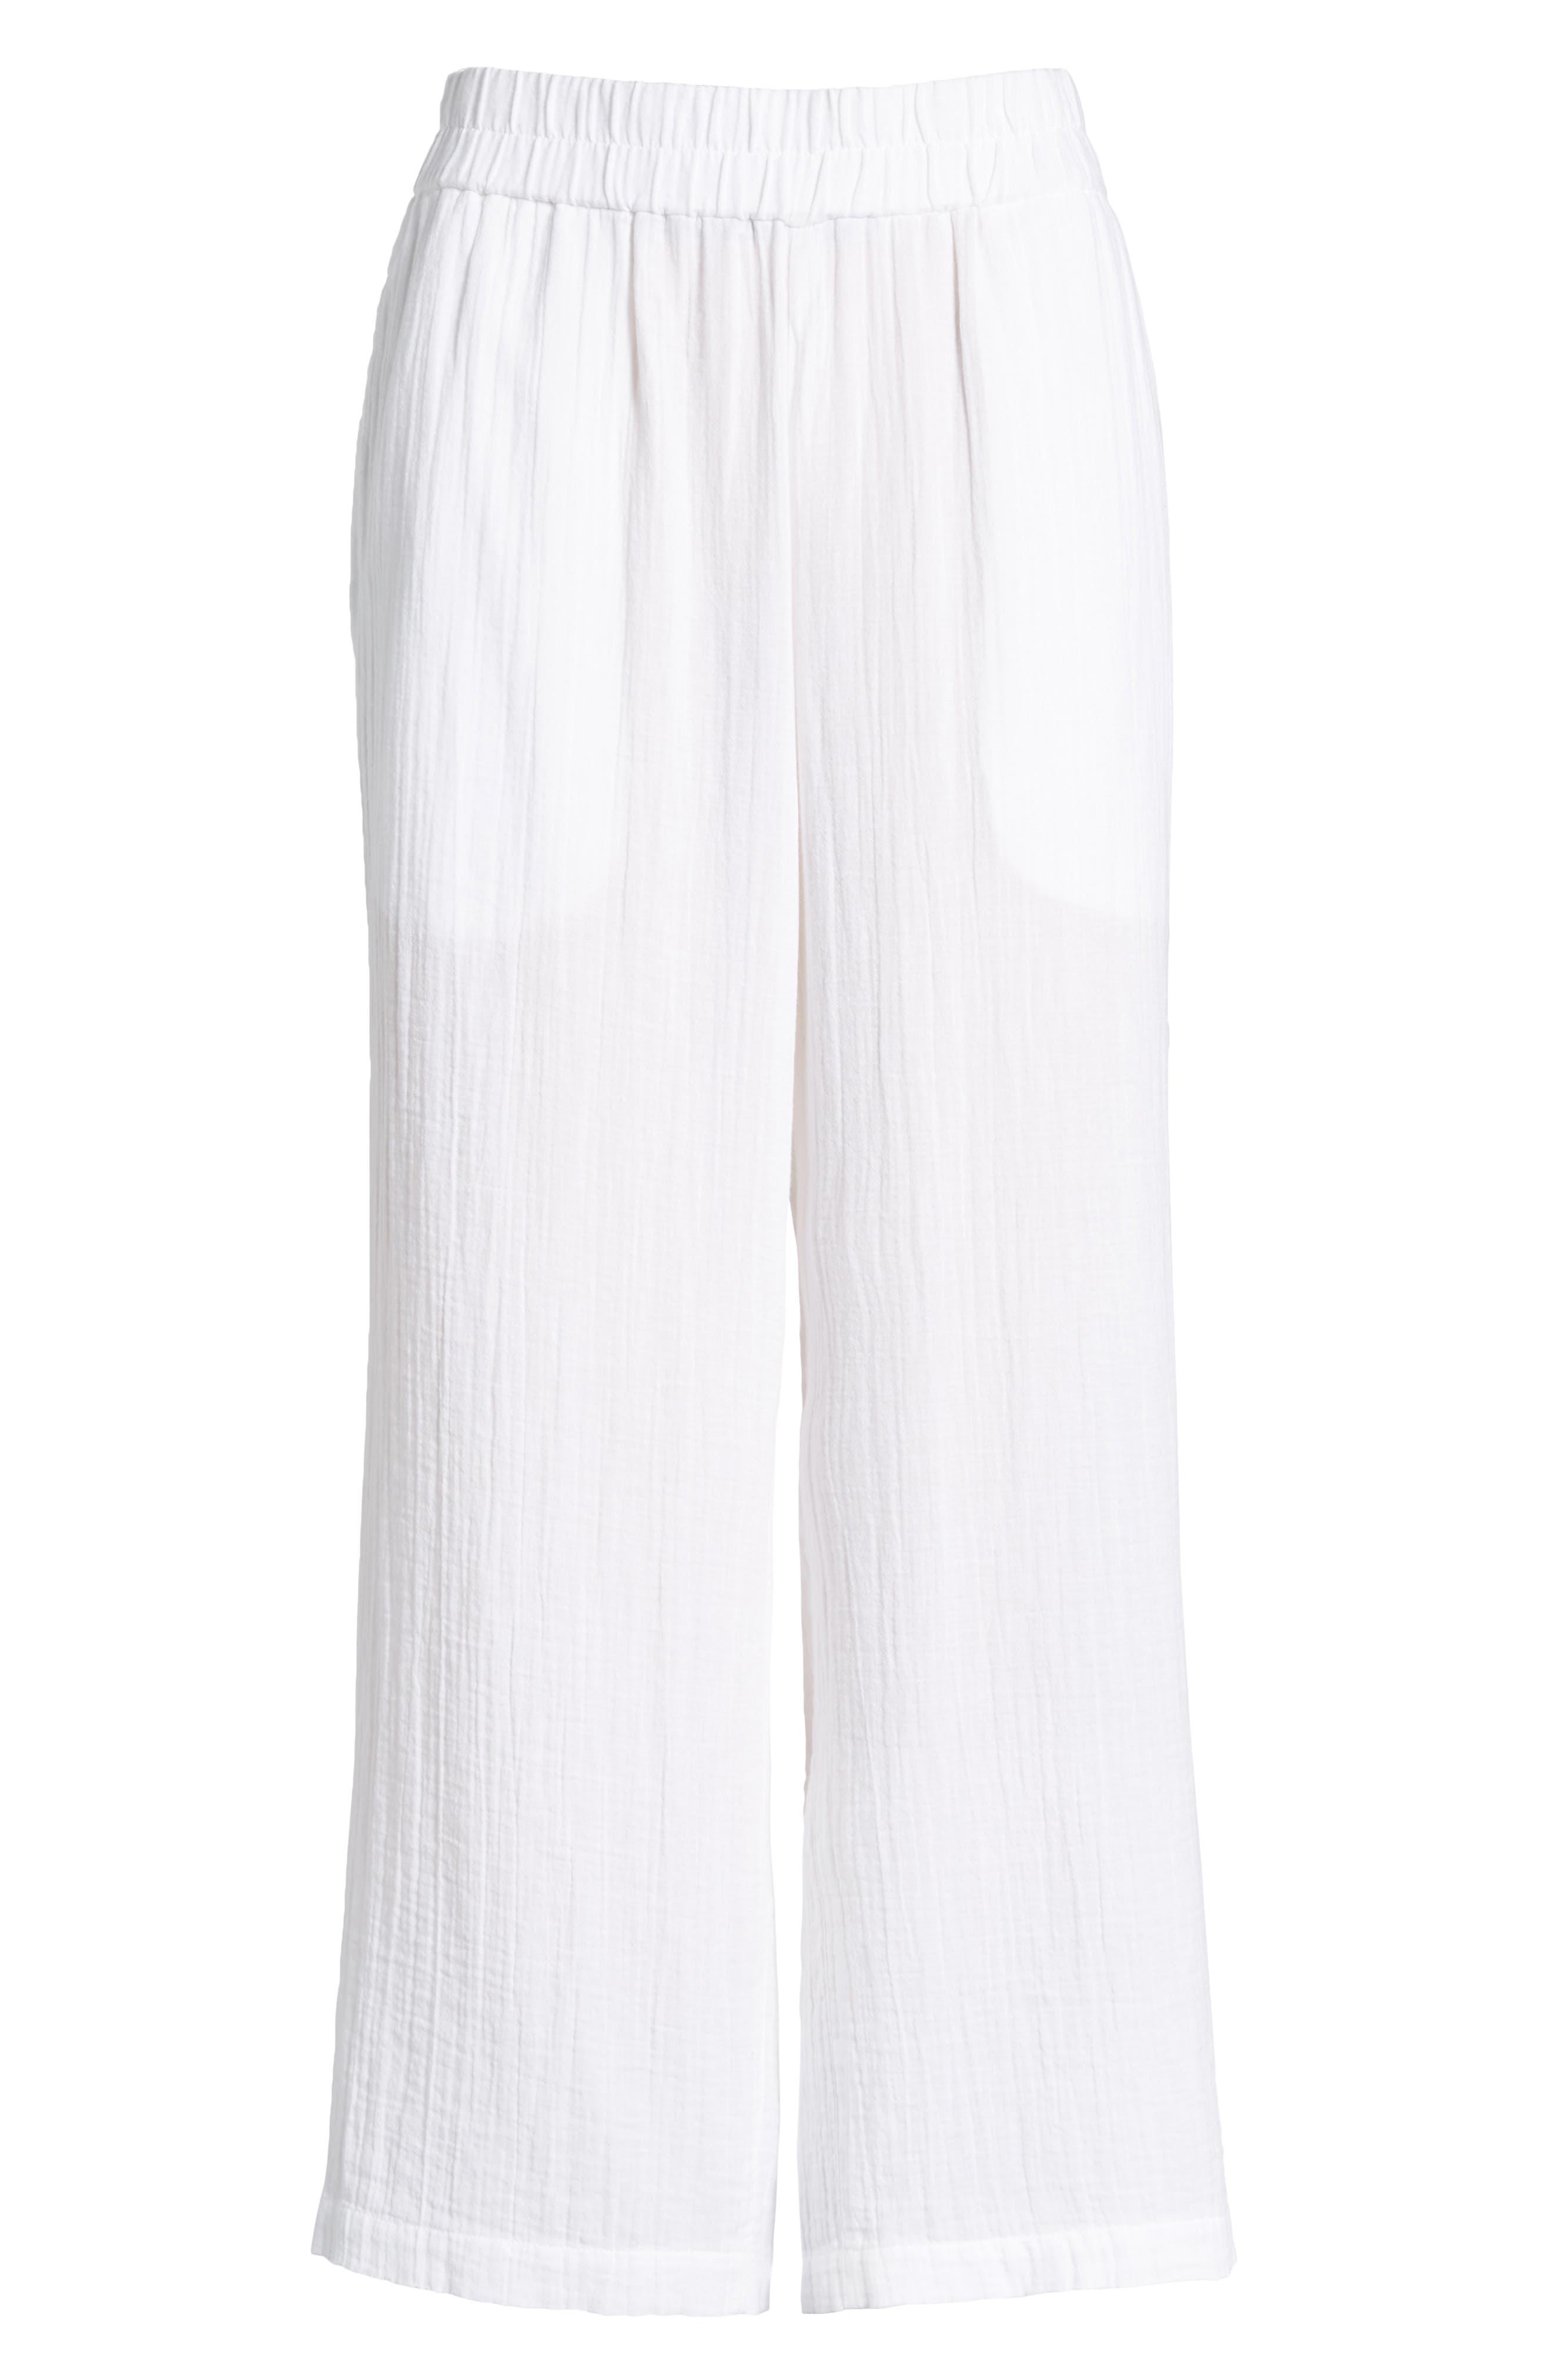 Straight Leg Organic Cotton Pants,                             Alternate thumbnail 7, color,                             White